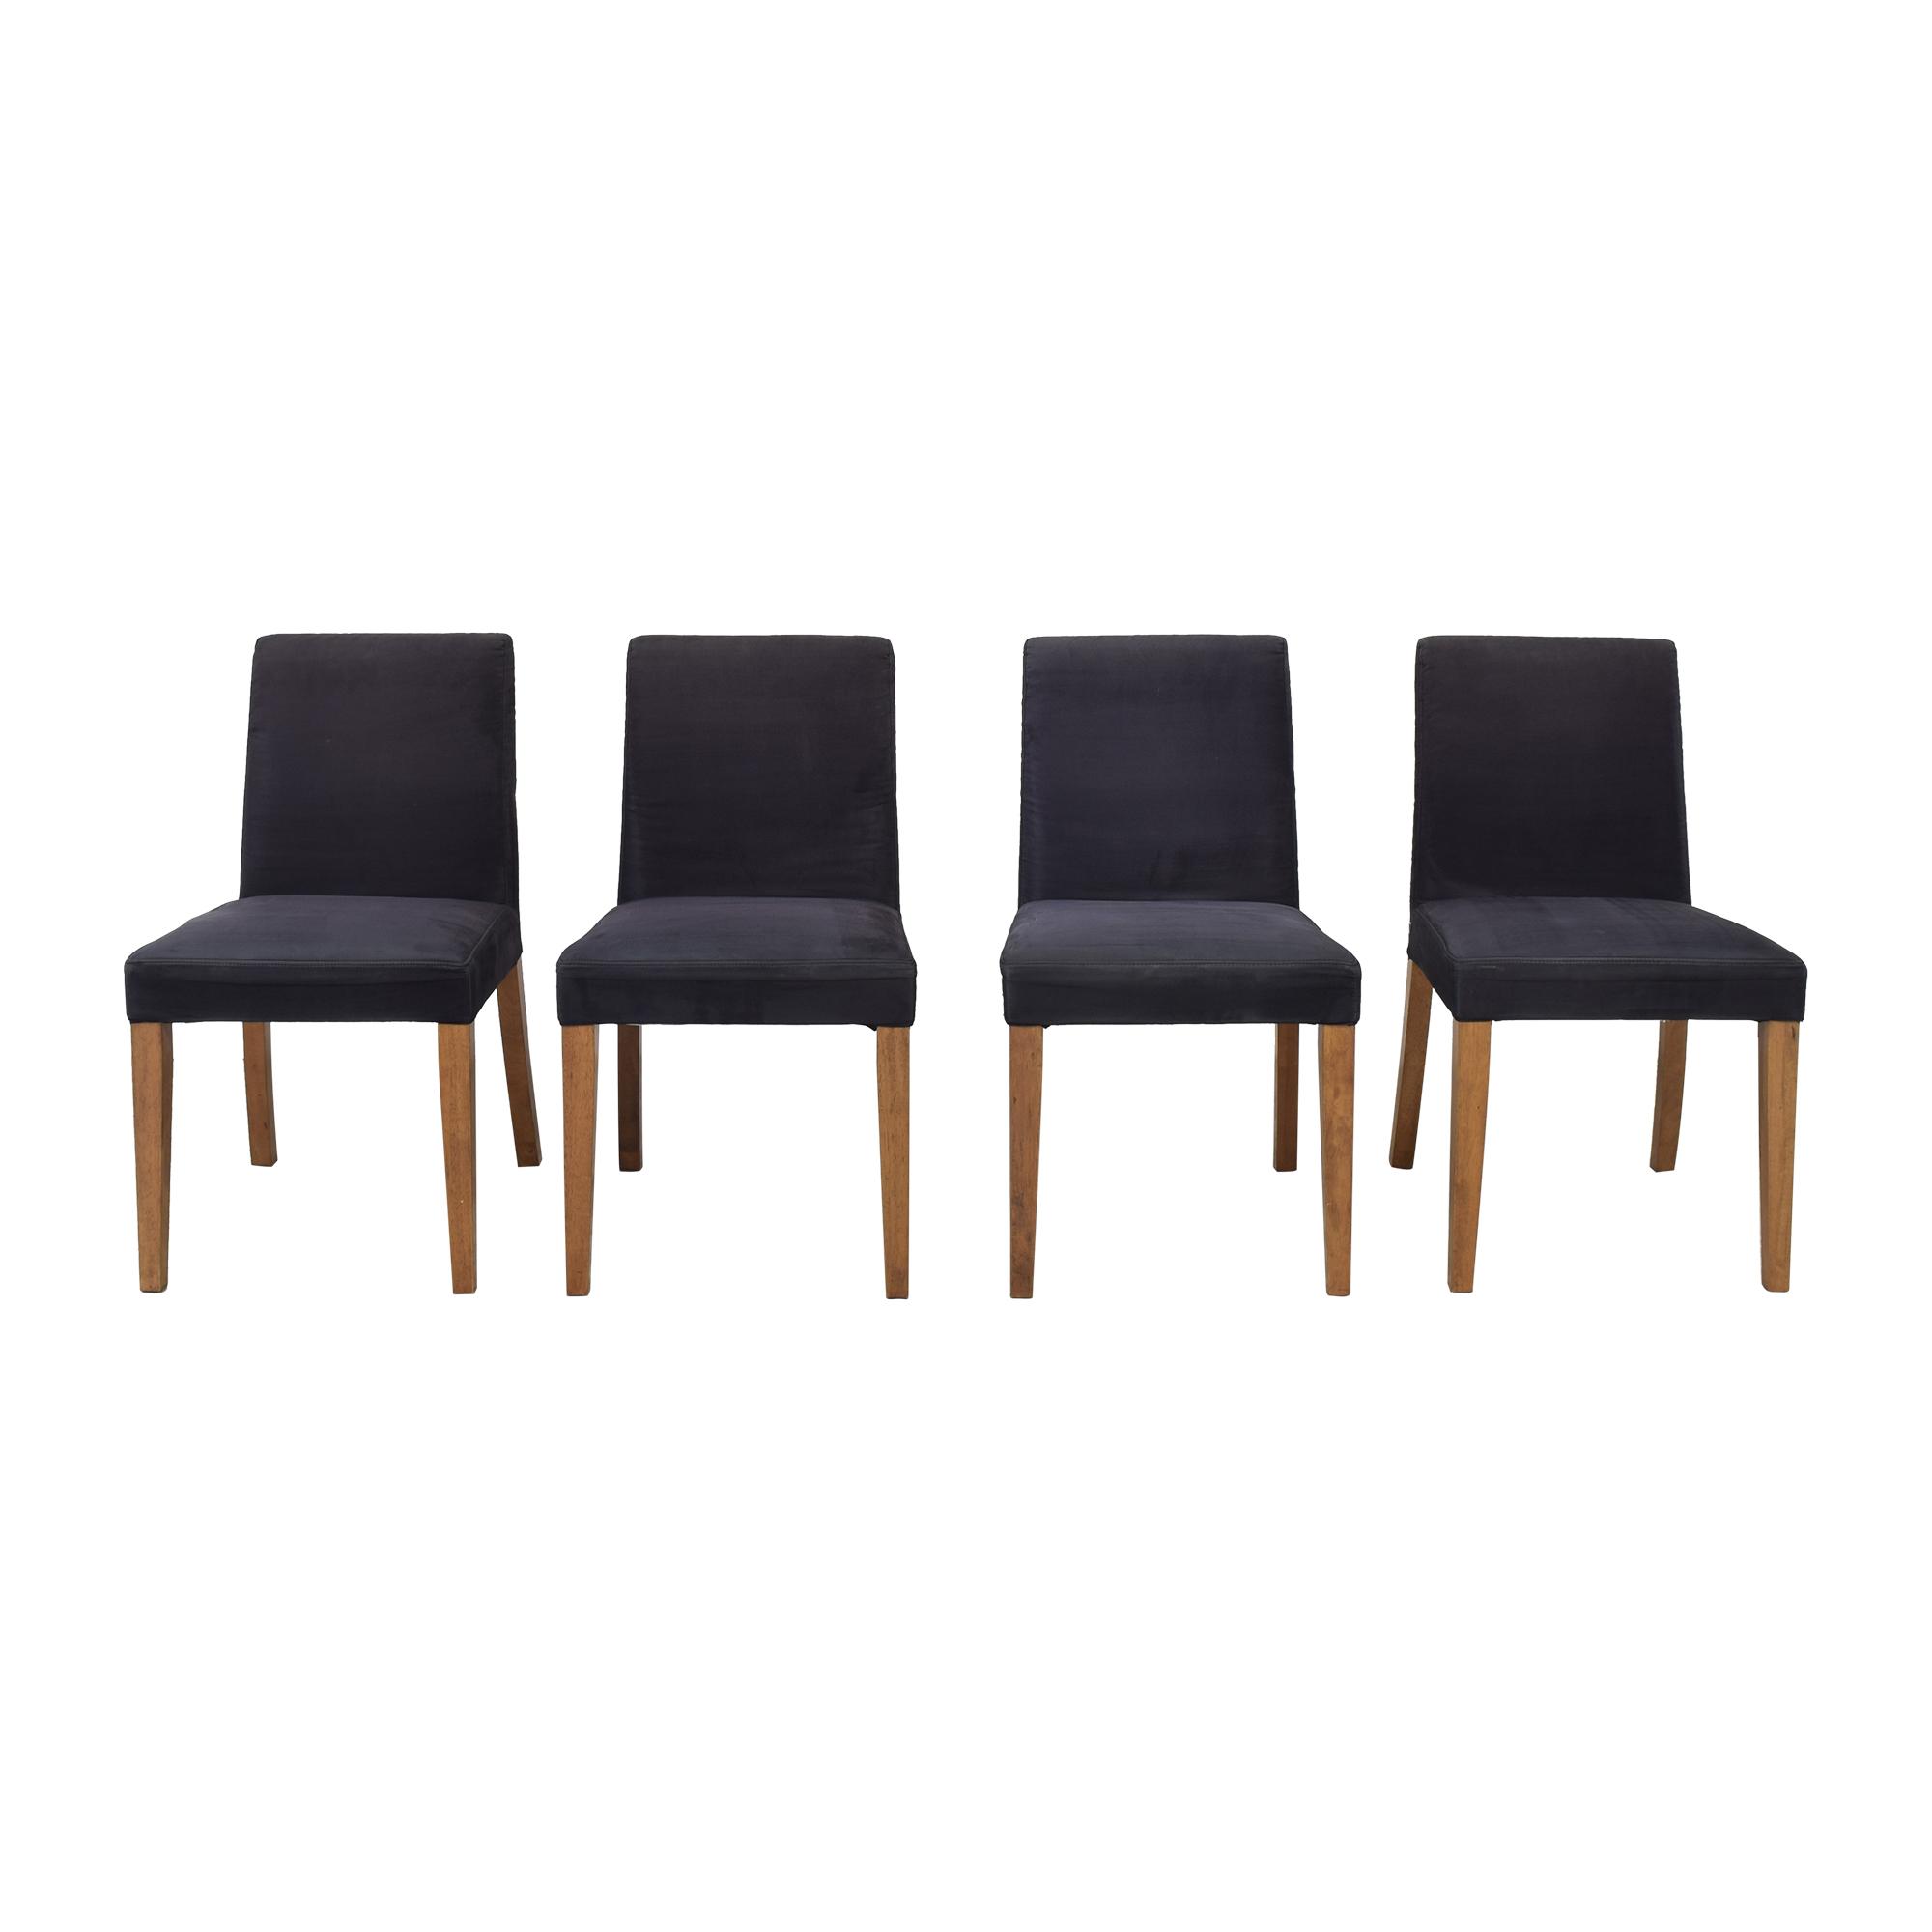 buy BoConcept BoConcept Cantono Upholstered Chairs online